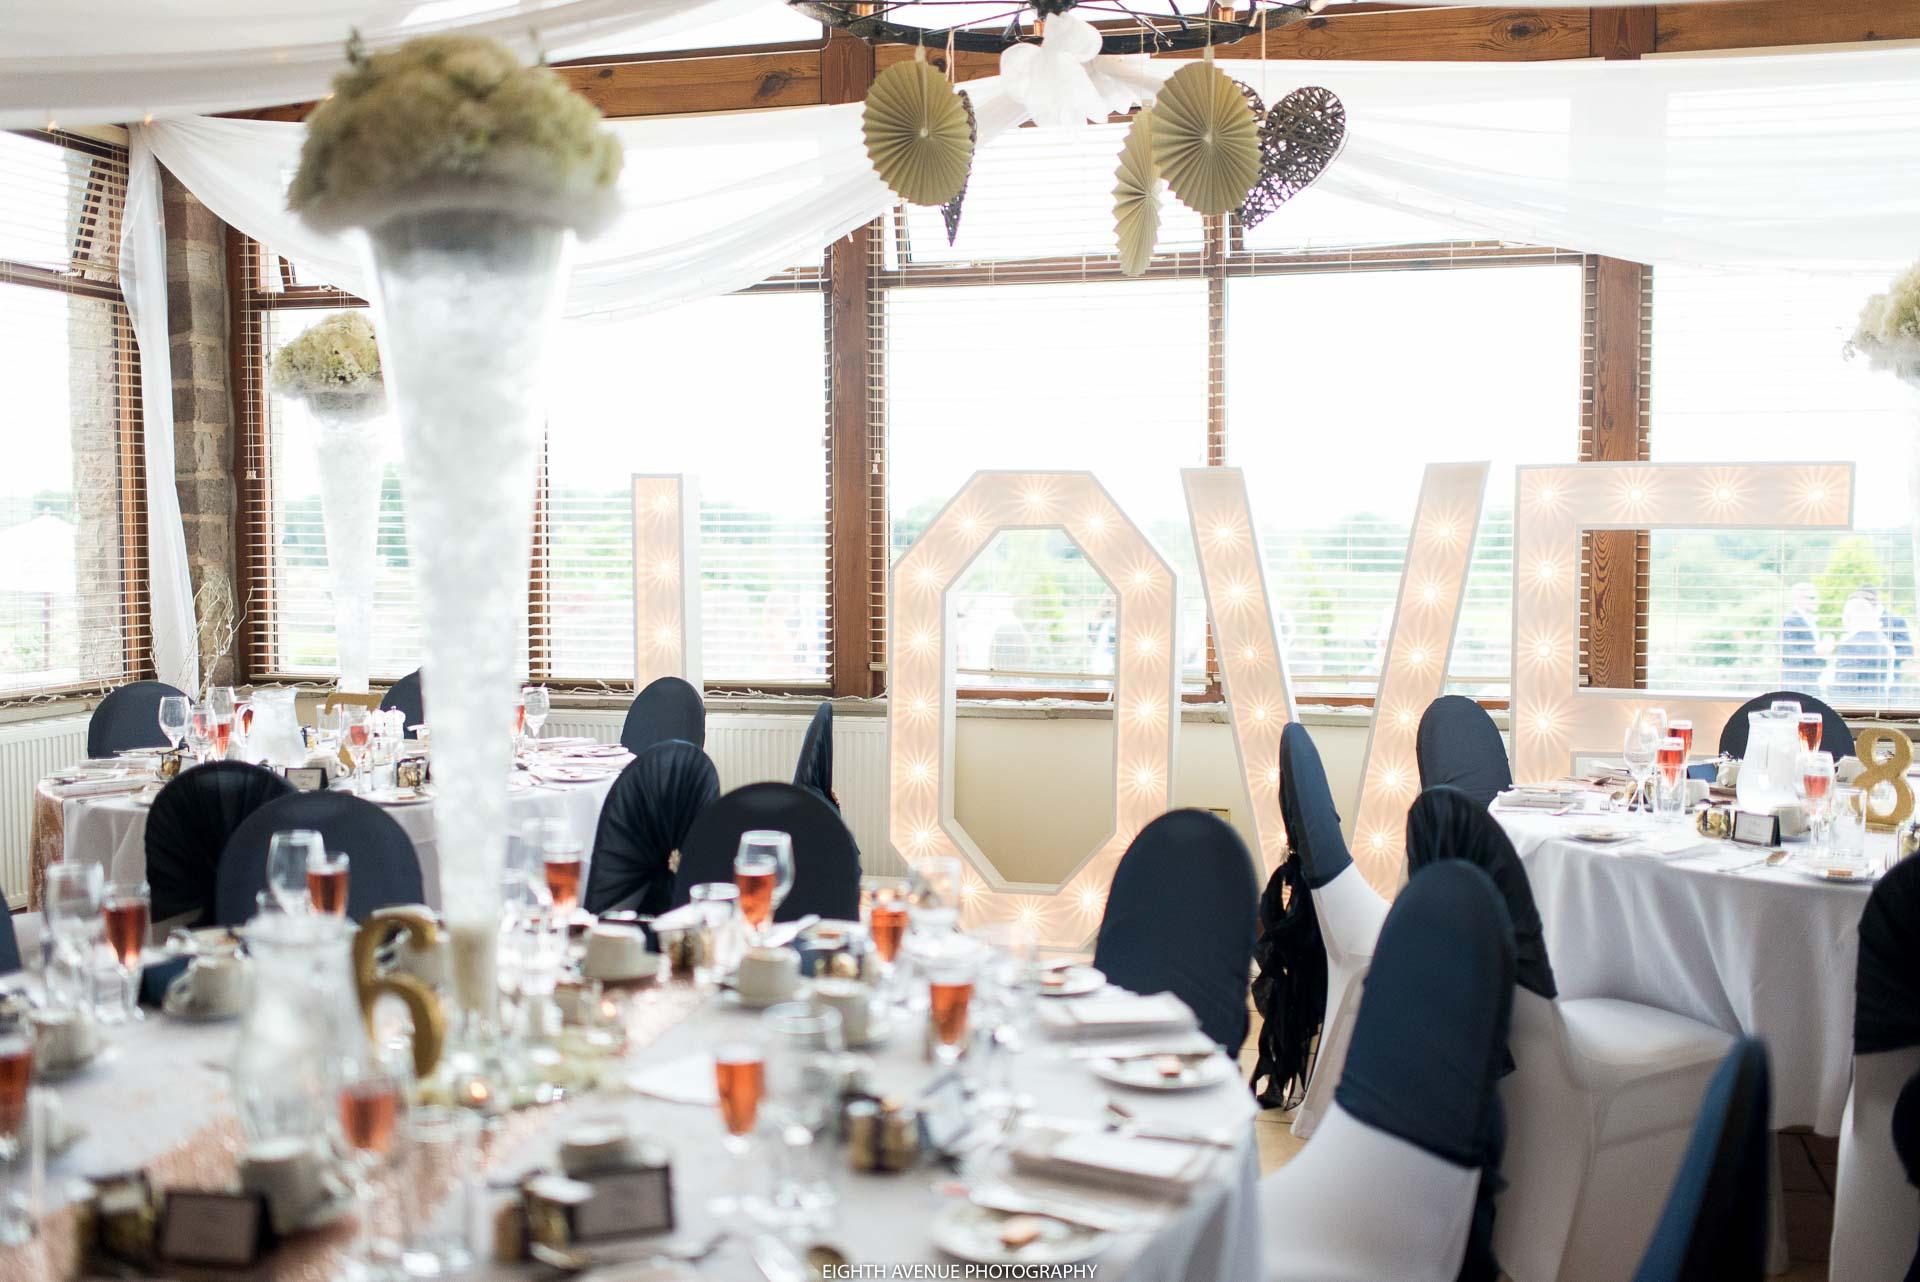 Wedding breakfast at Beeston Manor Wedding